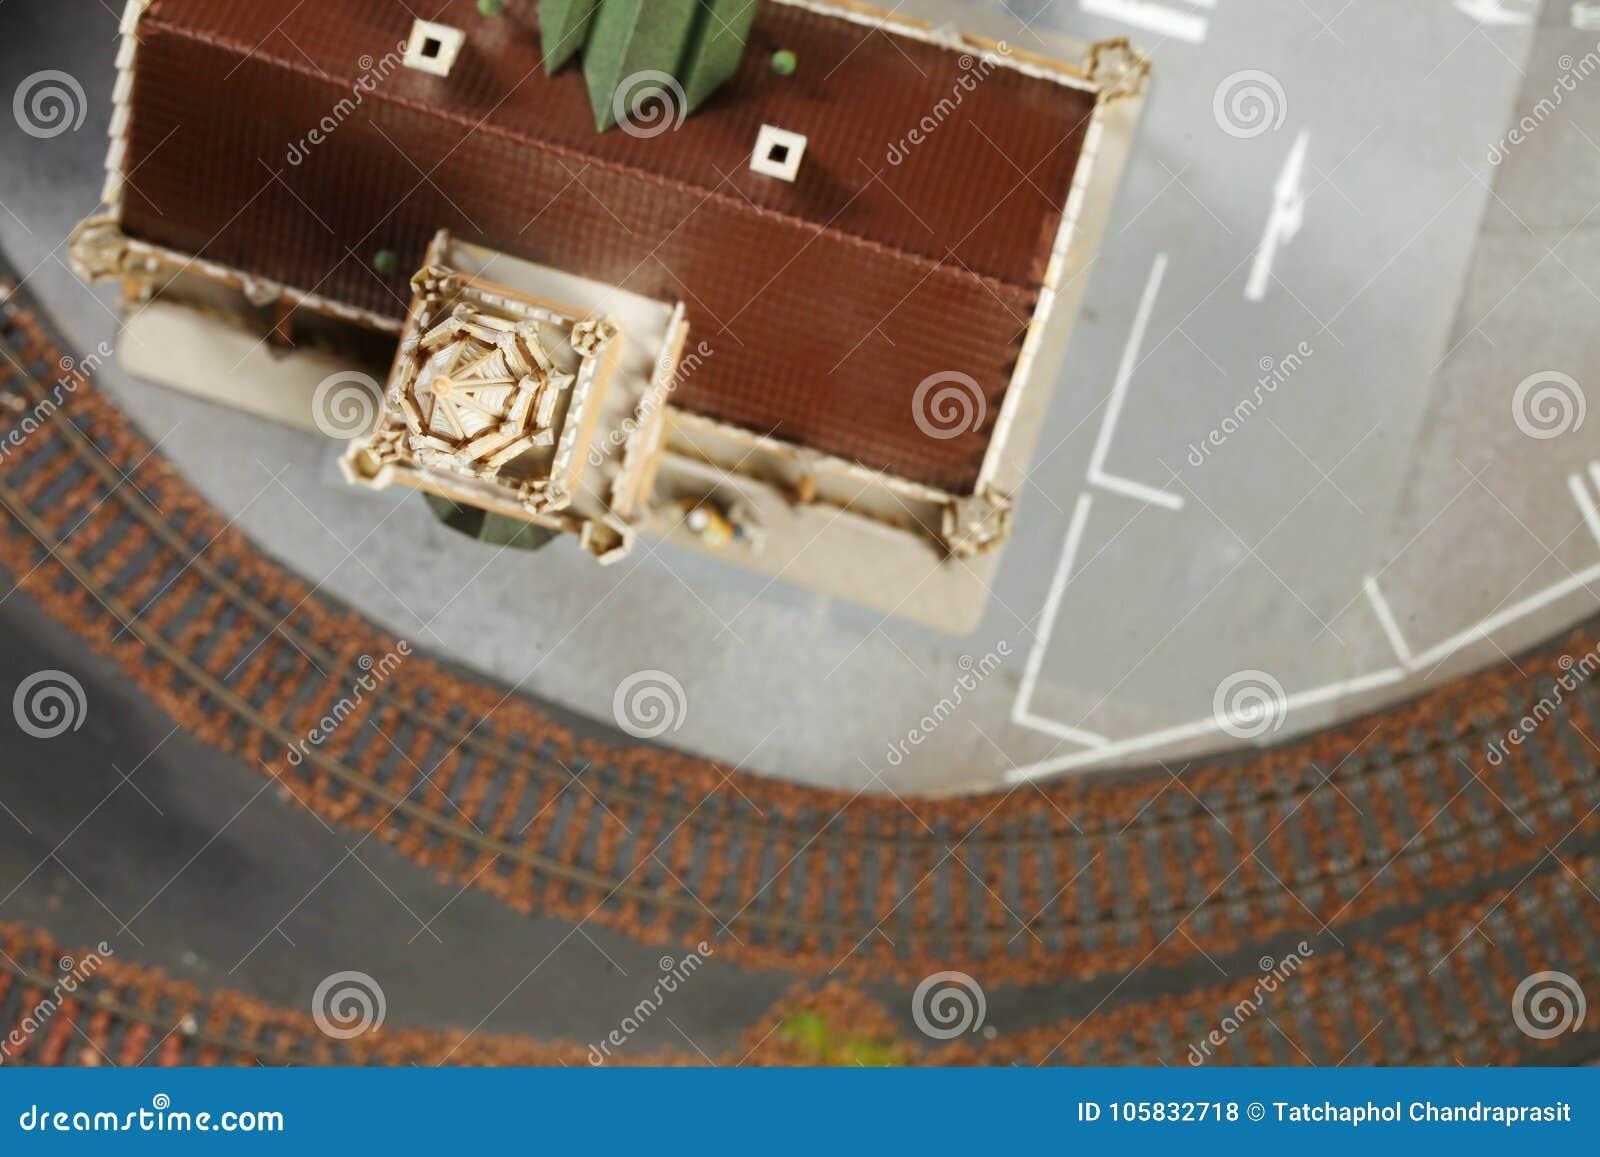 Model railroad on the miniature model scene.